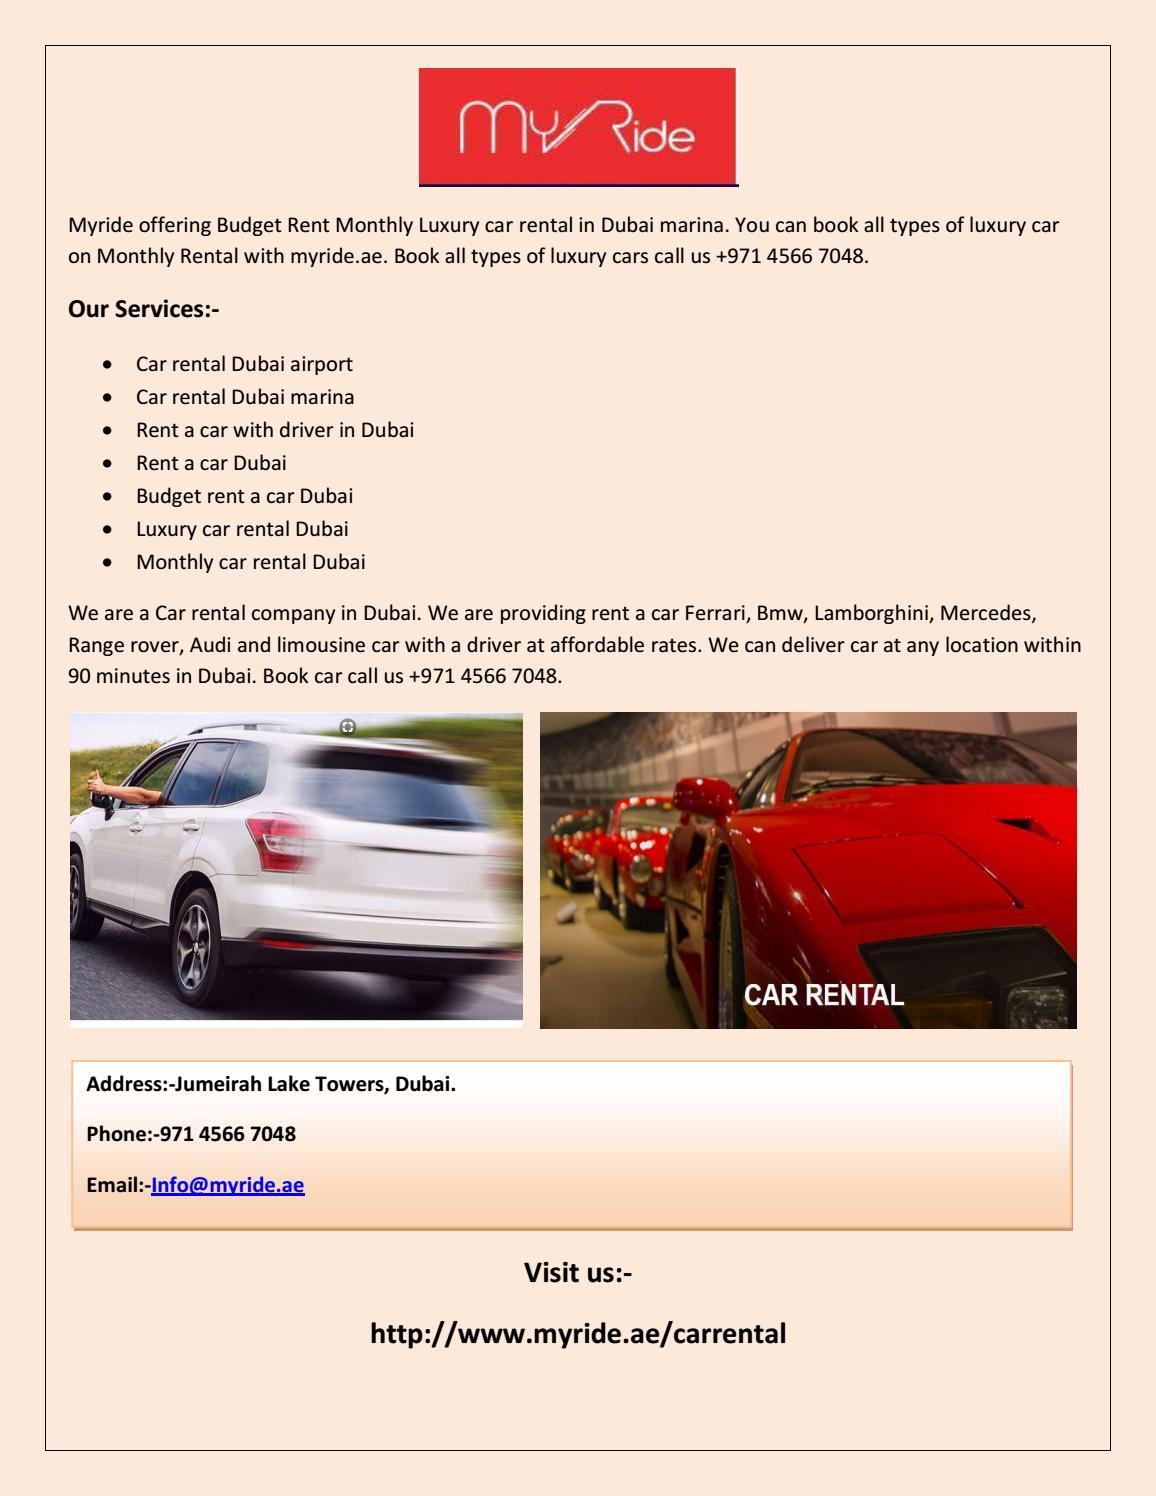 Myride Car Rental Dubai Airport Rent A Car Dubai Monthly Car